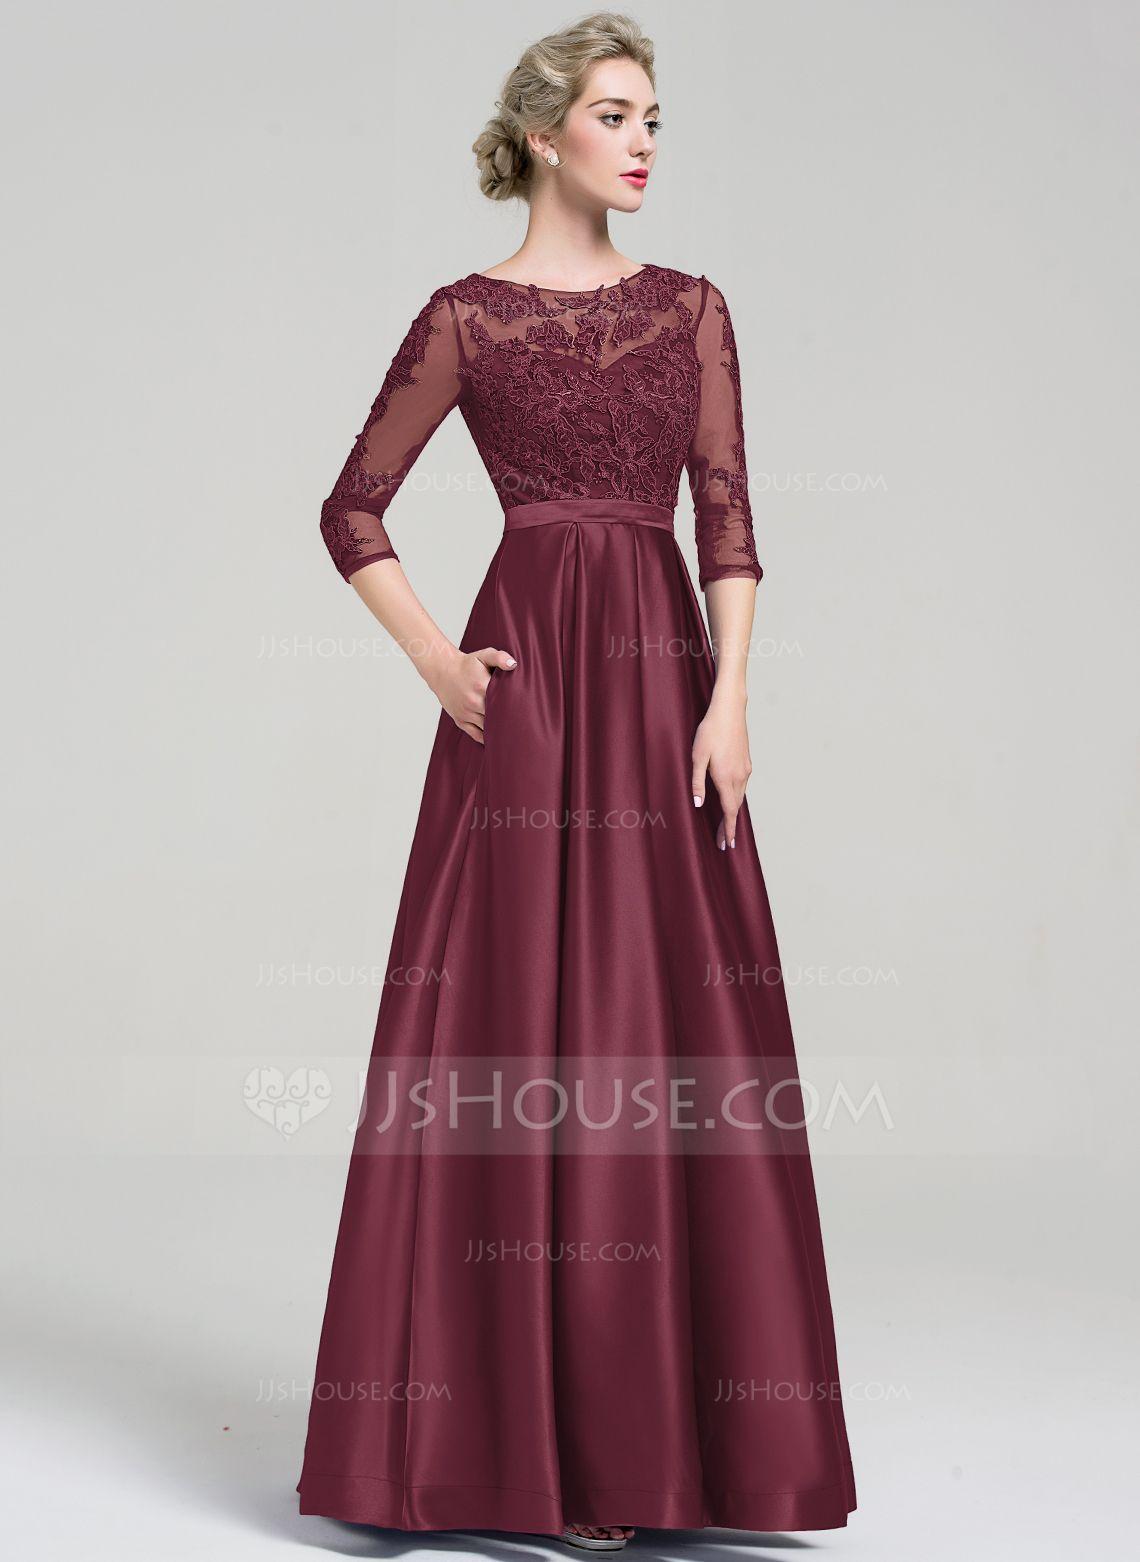 US$ 16.16] Ball-Gown Scoop Neck Floor-Length Satin Evening Dress